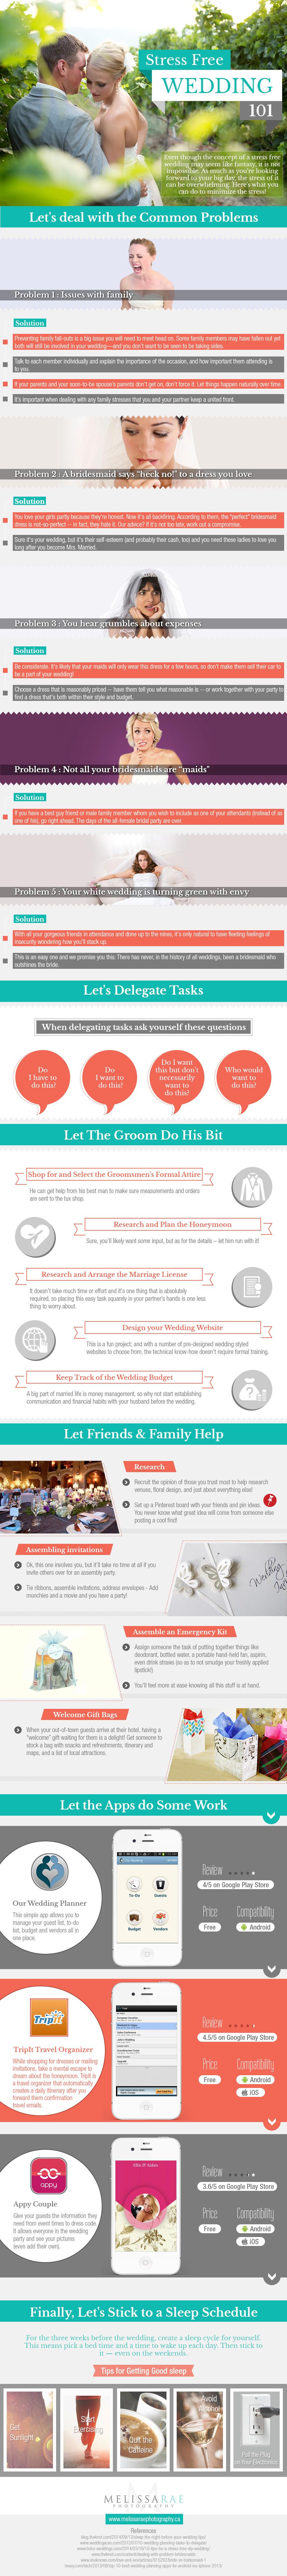 Stress Free Wedding 101